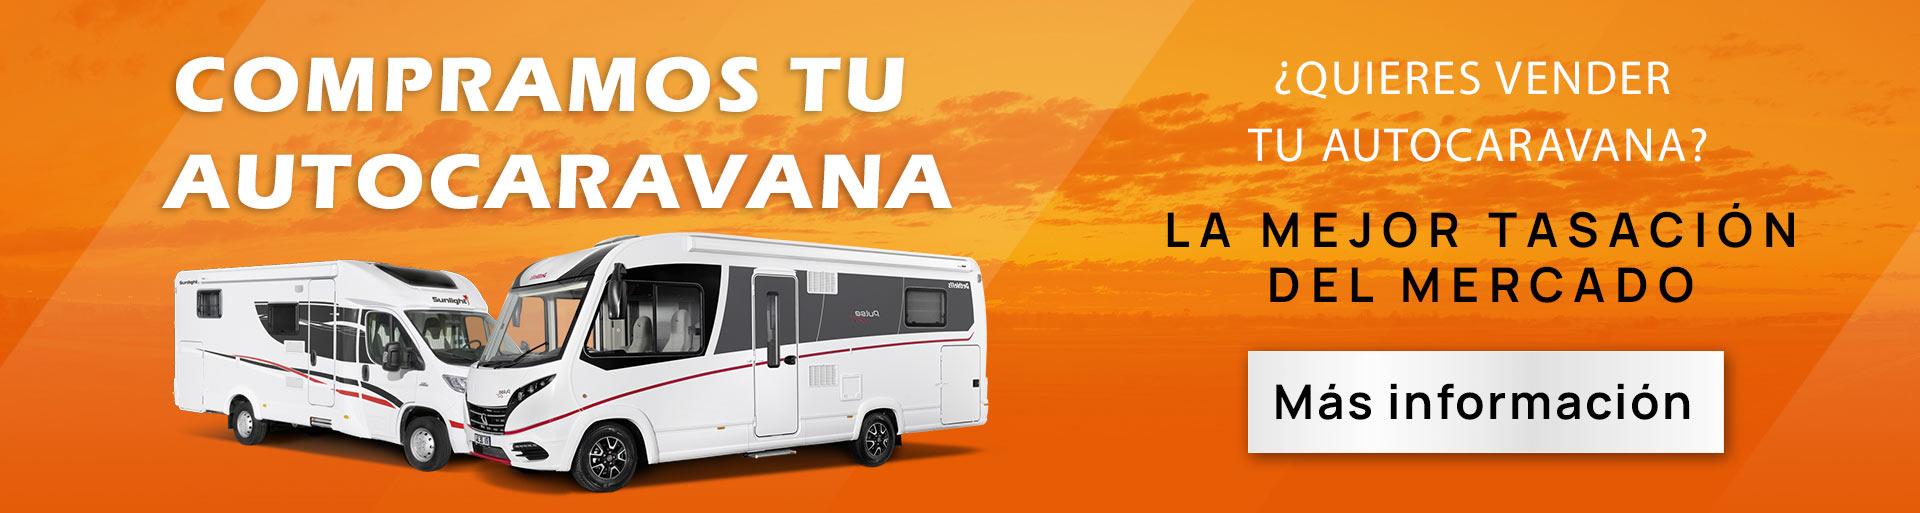 banner-home-compramos-tu-autocaravan_opti